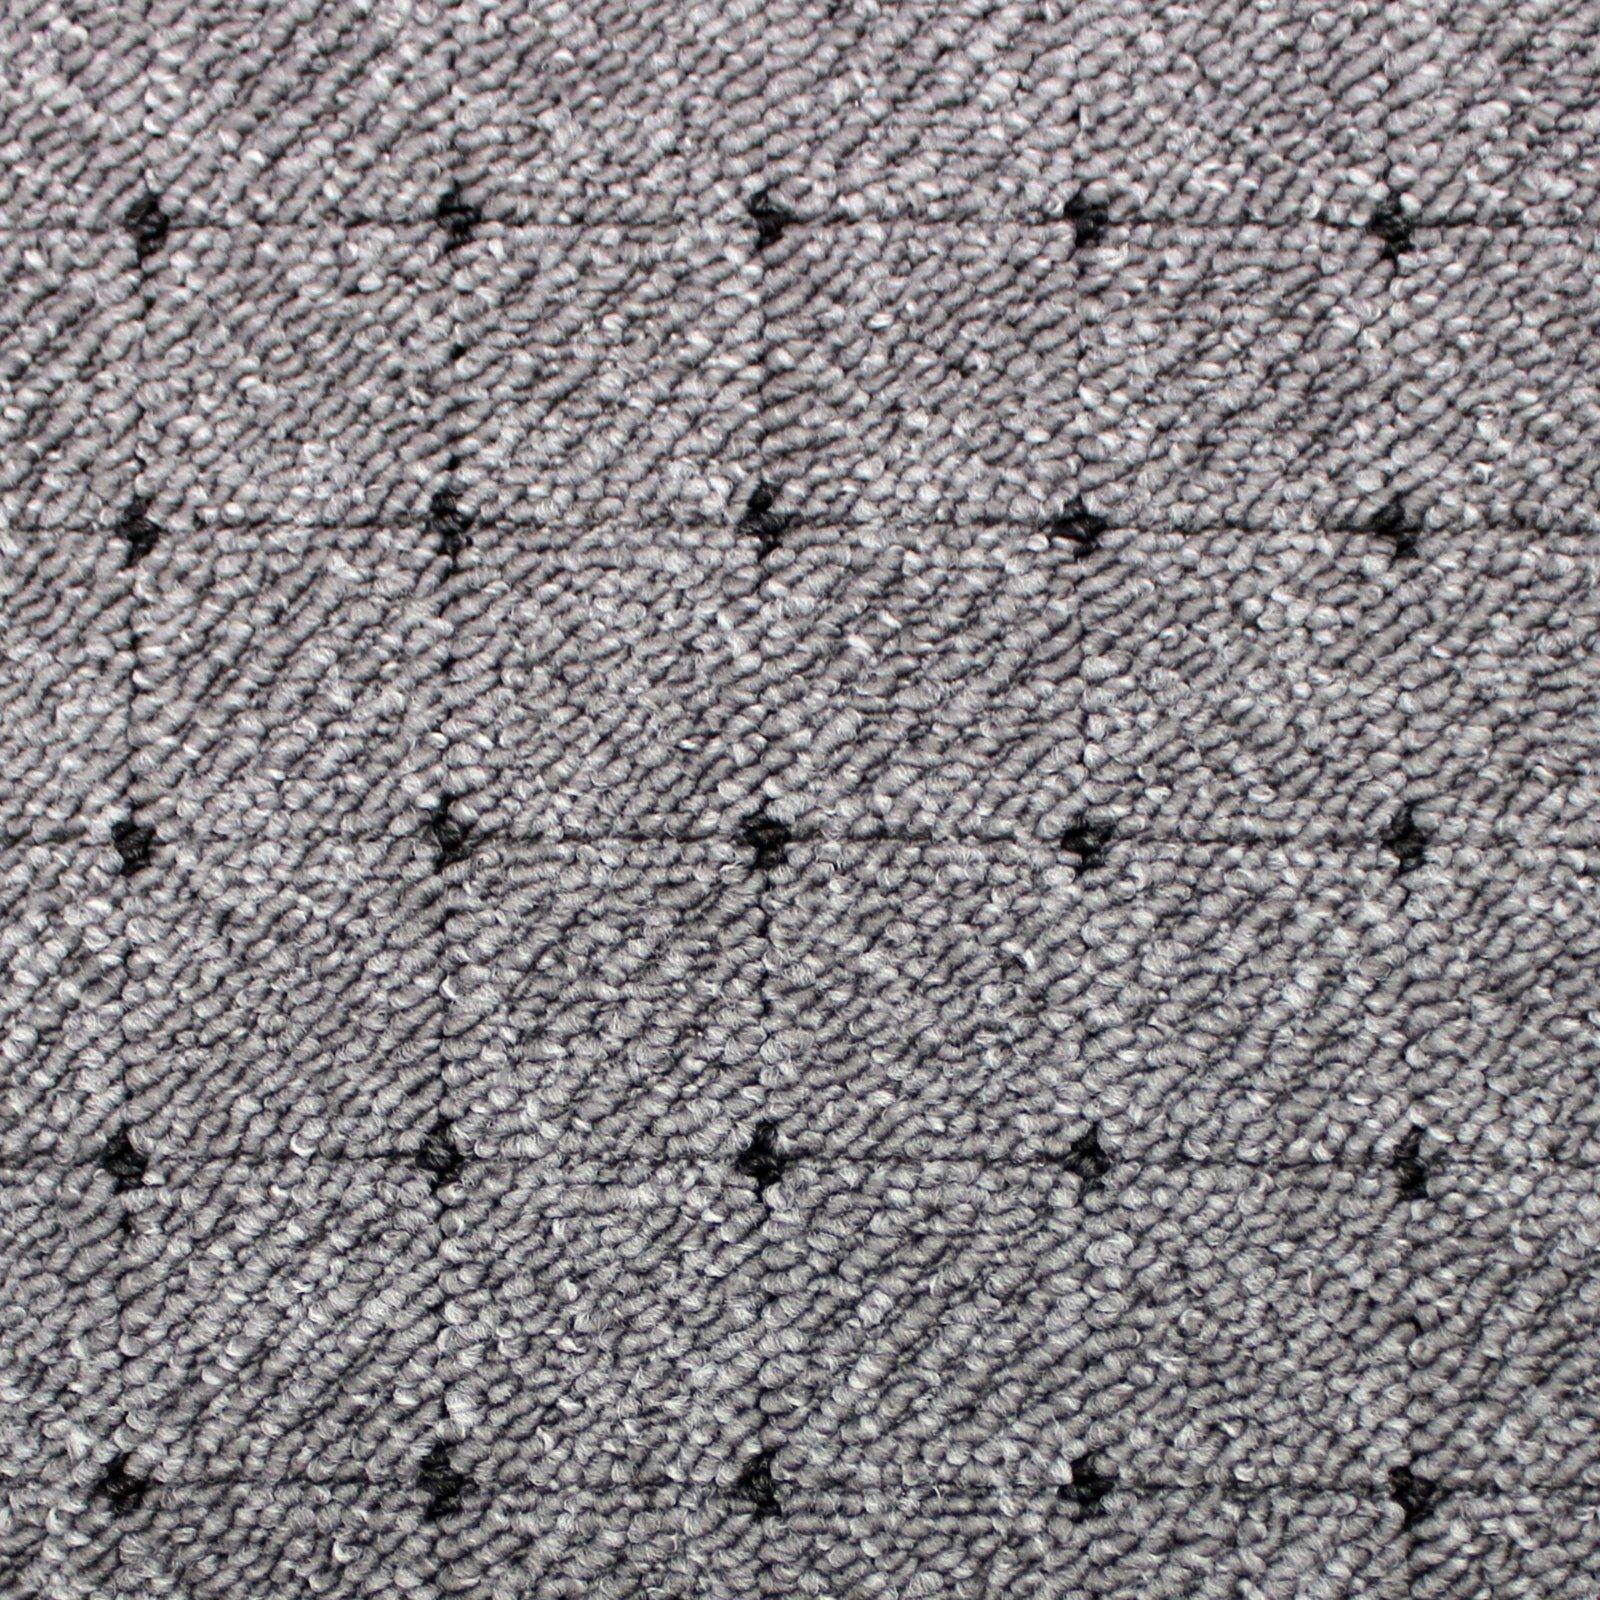 teppichboden aachen grau 5 meter breit teppichboden bodenbel ge baumarkt roller. Black Bedroom Furniture Sets. Home Design Ideas